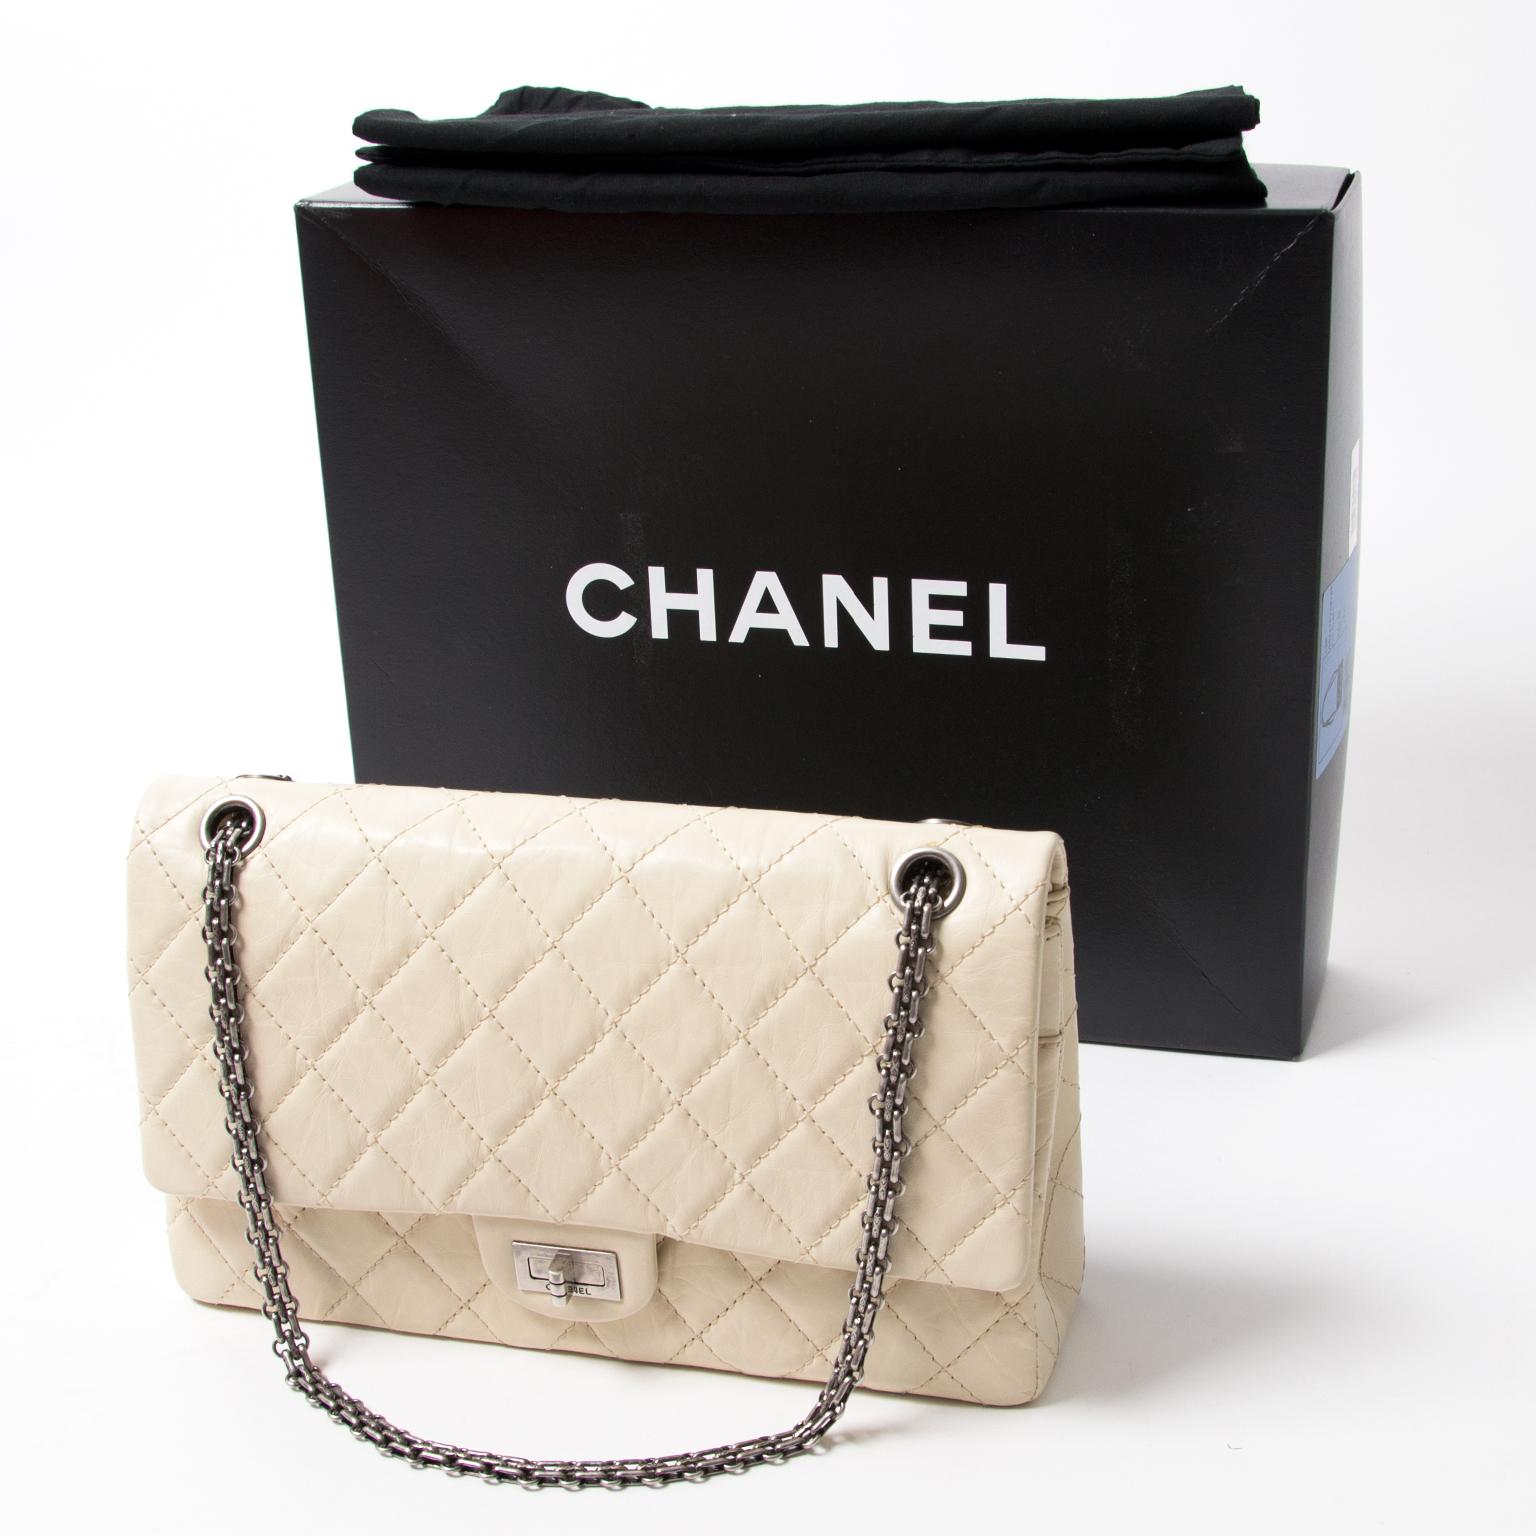 9e329eb2239335 chanel 2.55 medium flapbag in perfect condition 100% authentic vintage  luxury net als nieuw witte chanel 2.55 reissue 100% authentiek tweedehands  merk tas ...